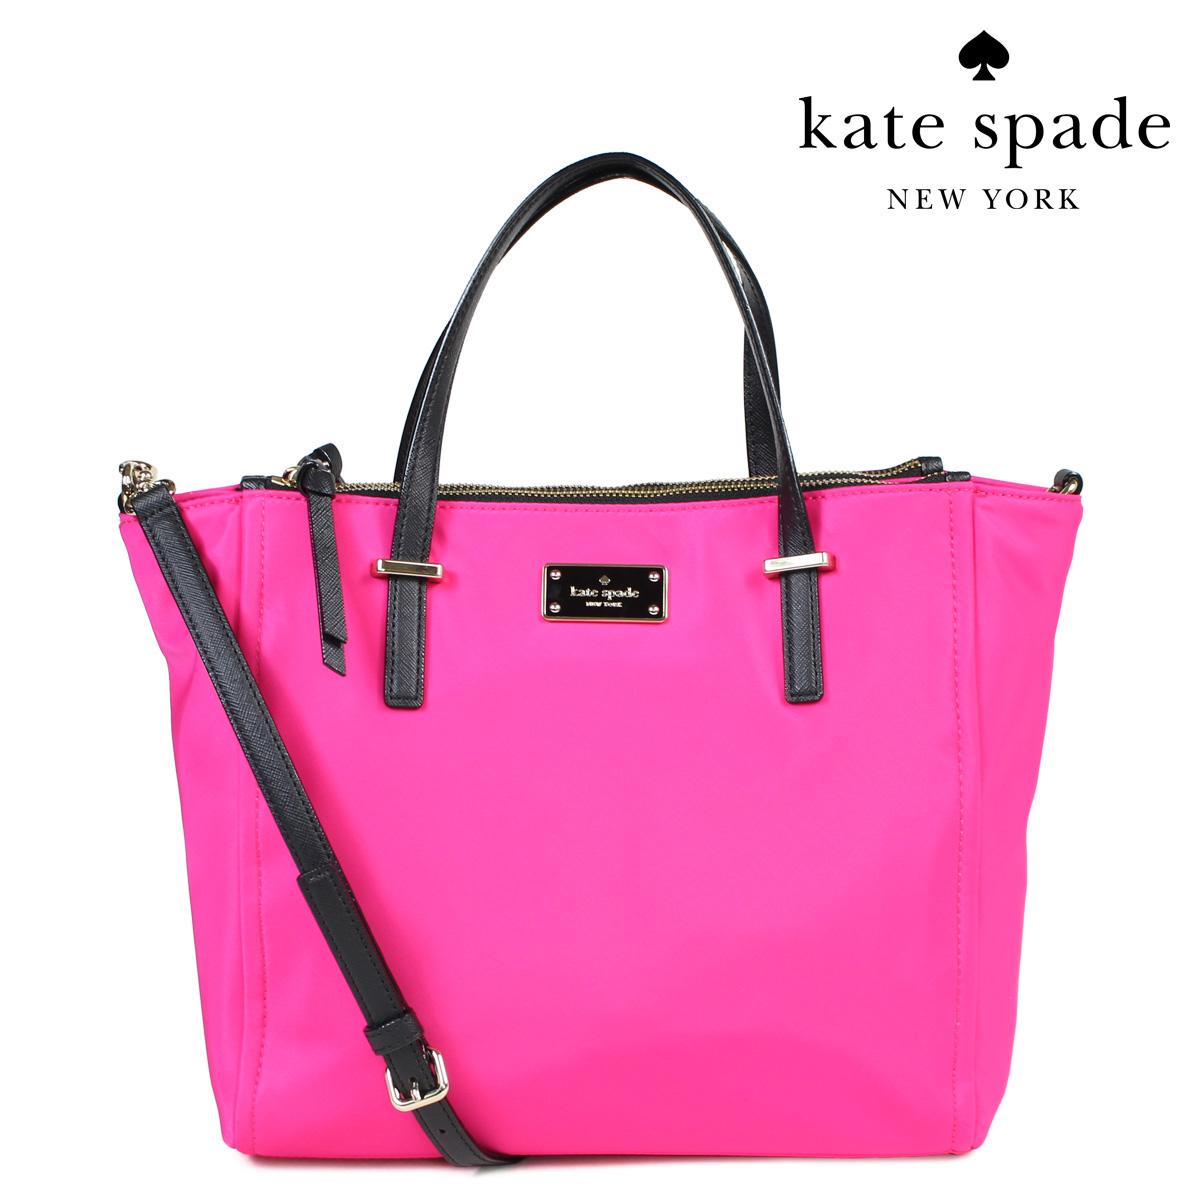 kate spade バッグ トートバッグ ナイロン ケイトスペード ALYSE WKRU4715 649 2WAY レディース ピンク